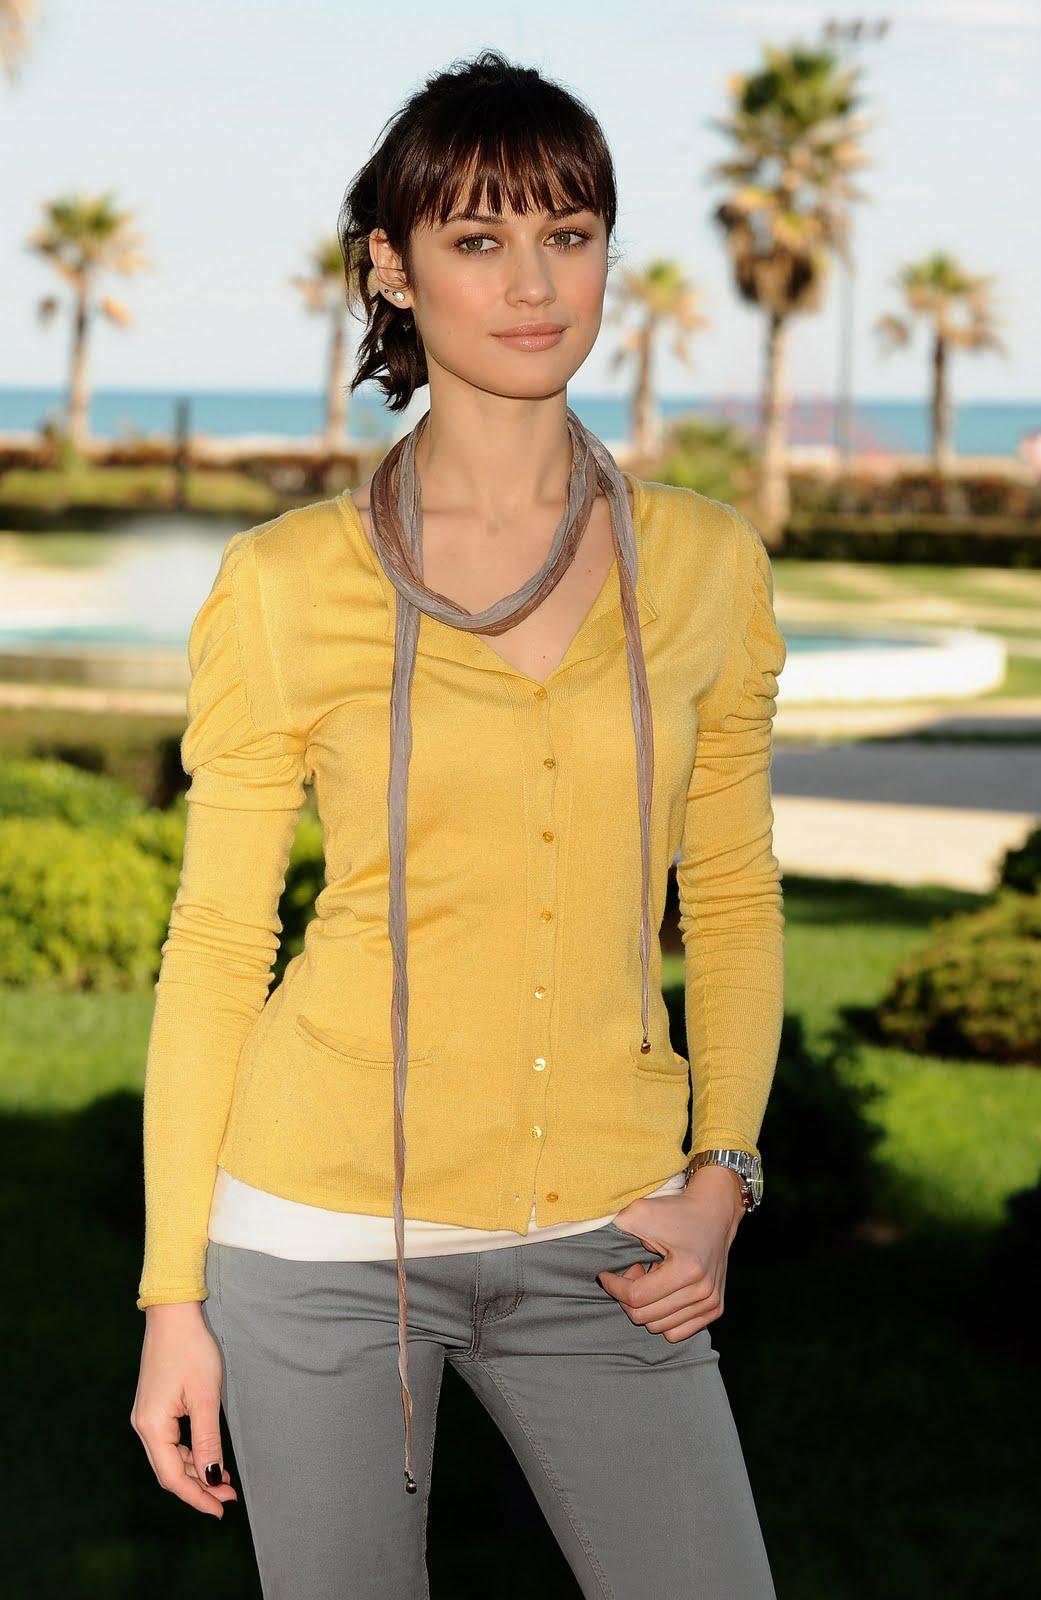 Olga Kurylenko Actresses The Premium Gallery Of Hq